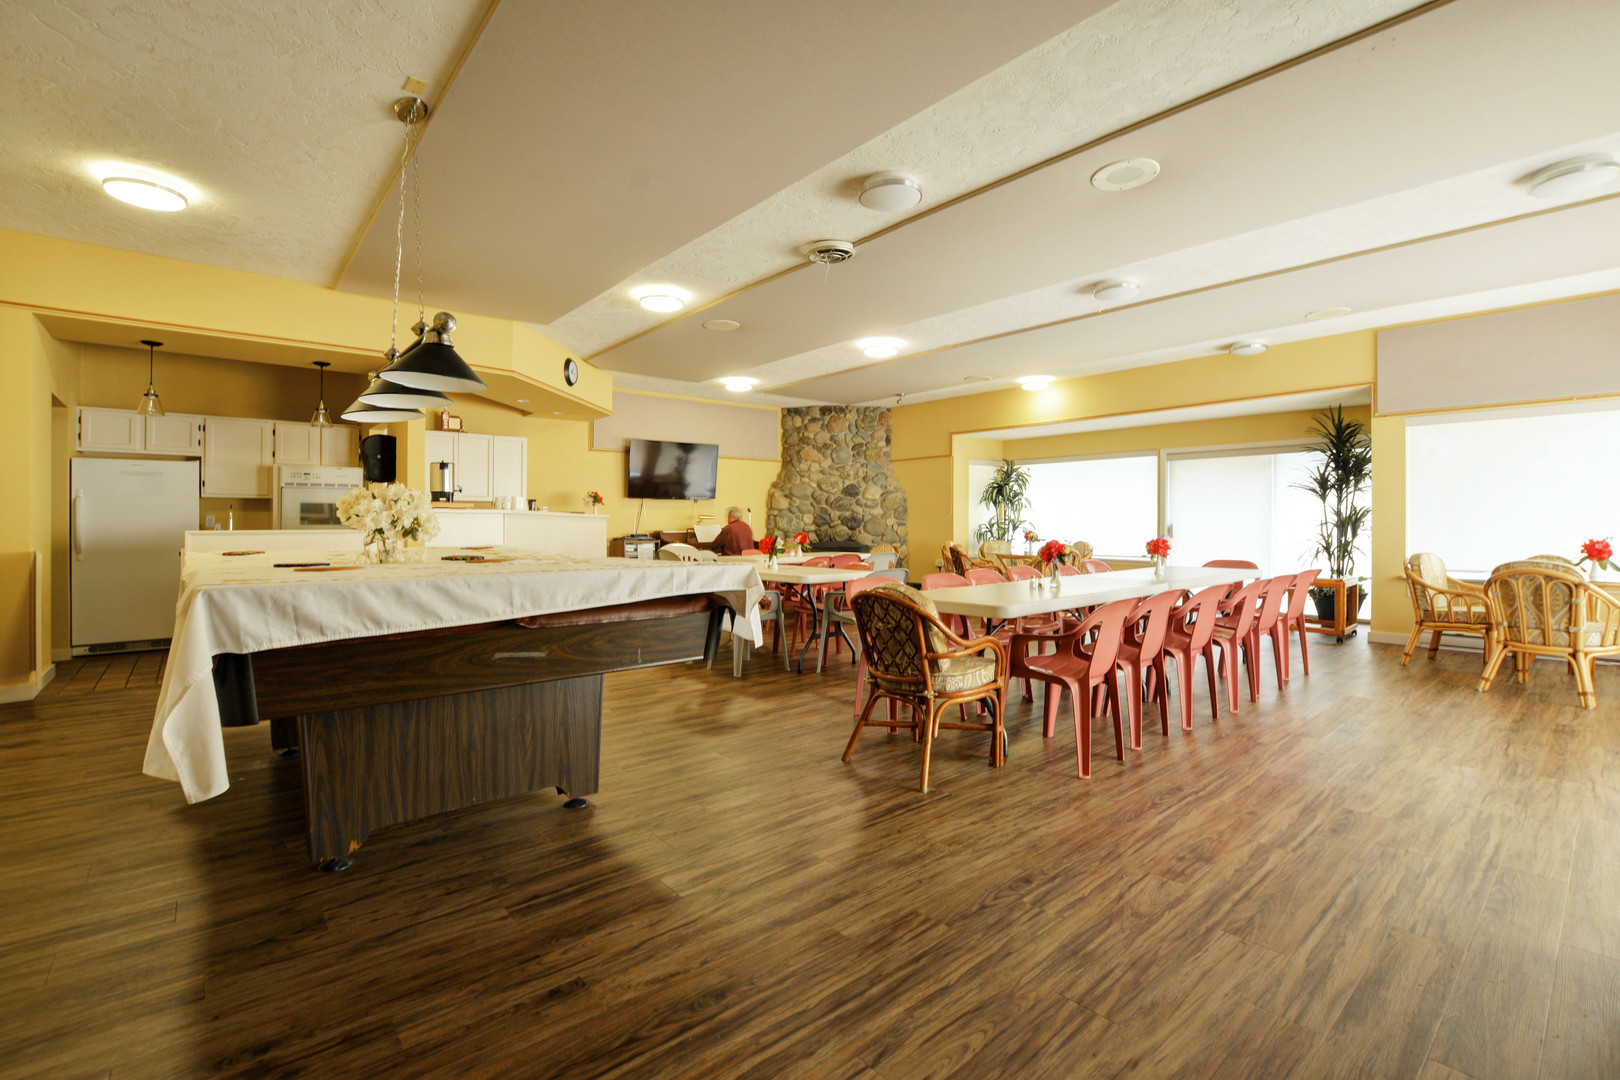 Club house common room